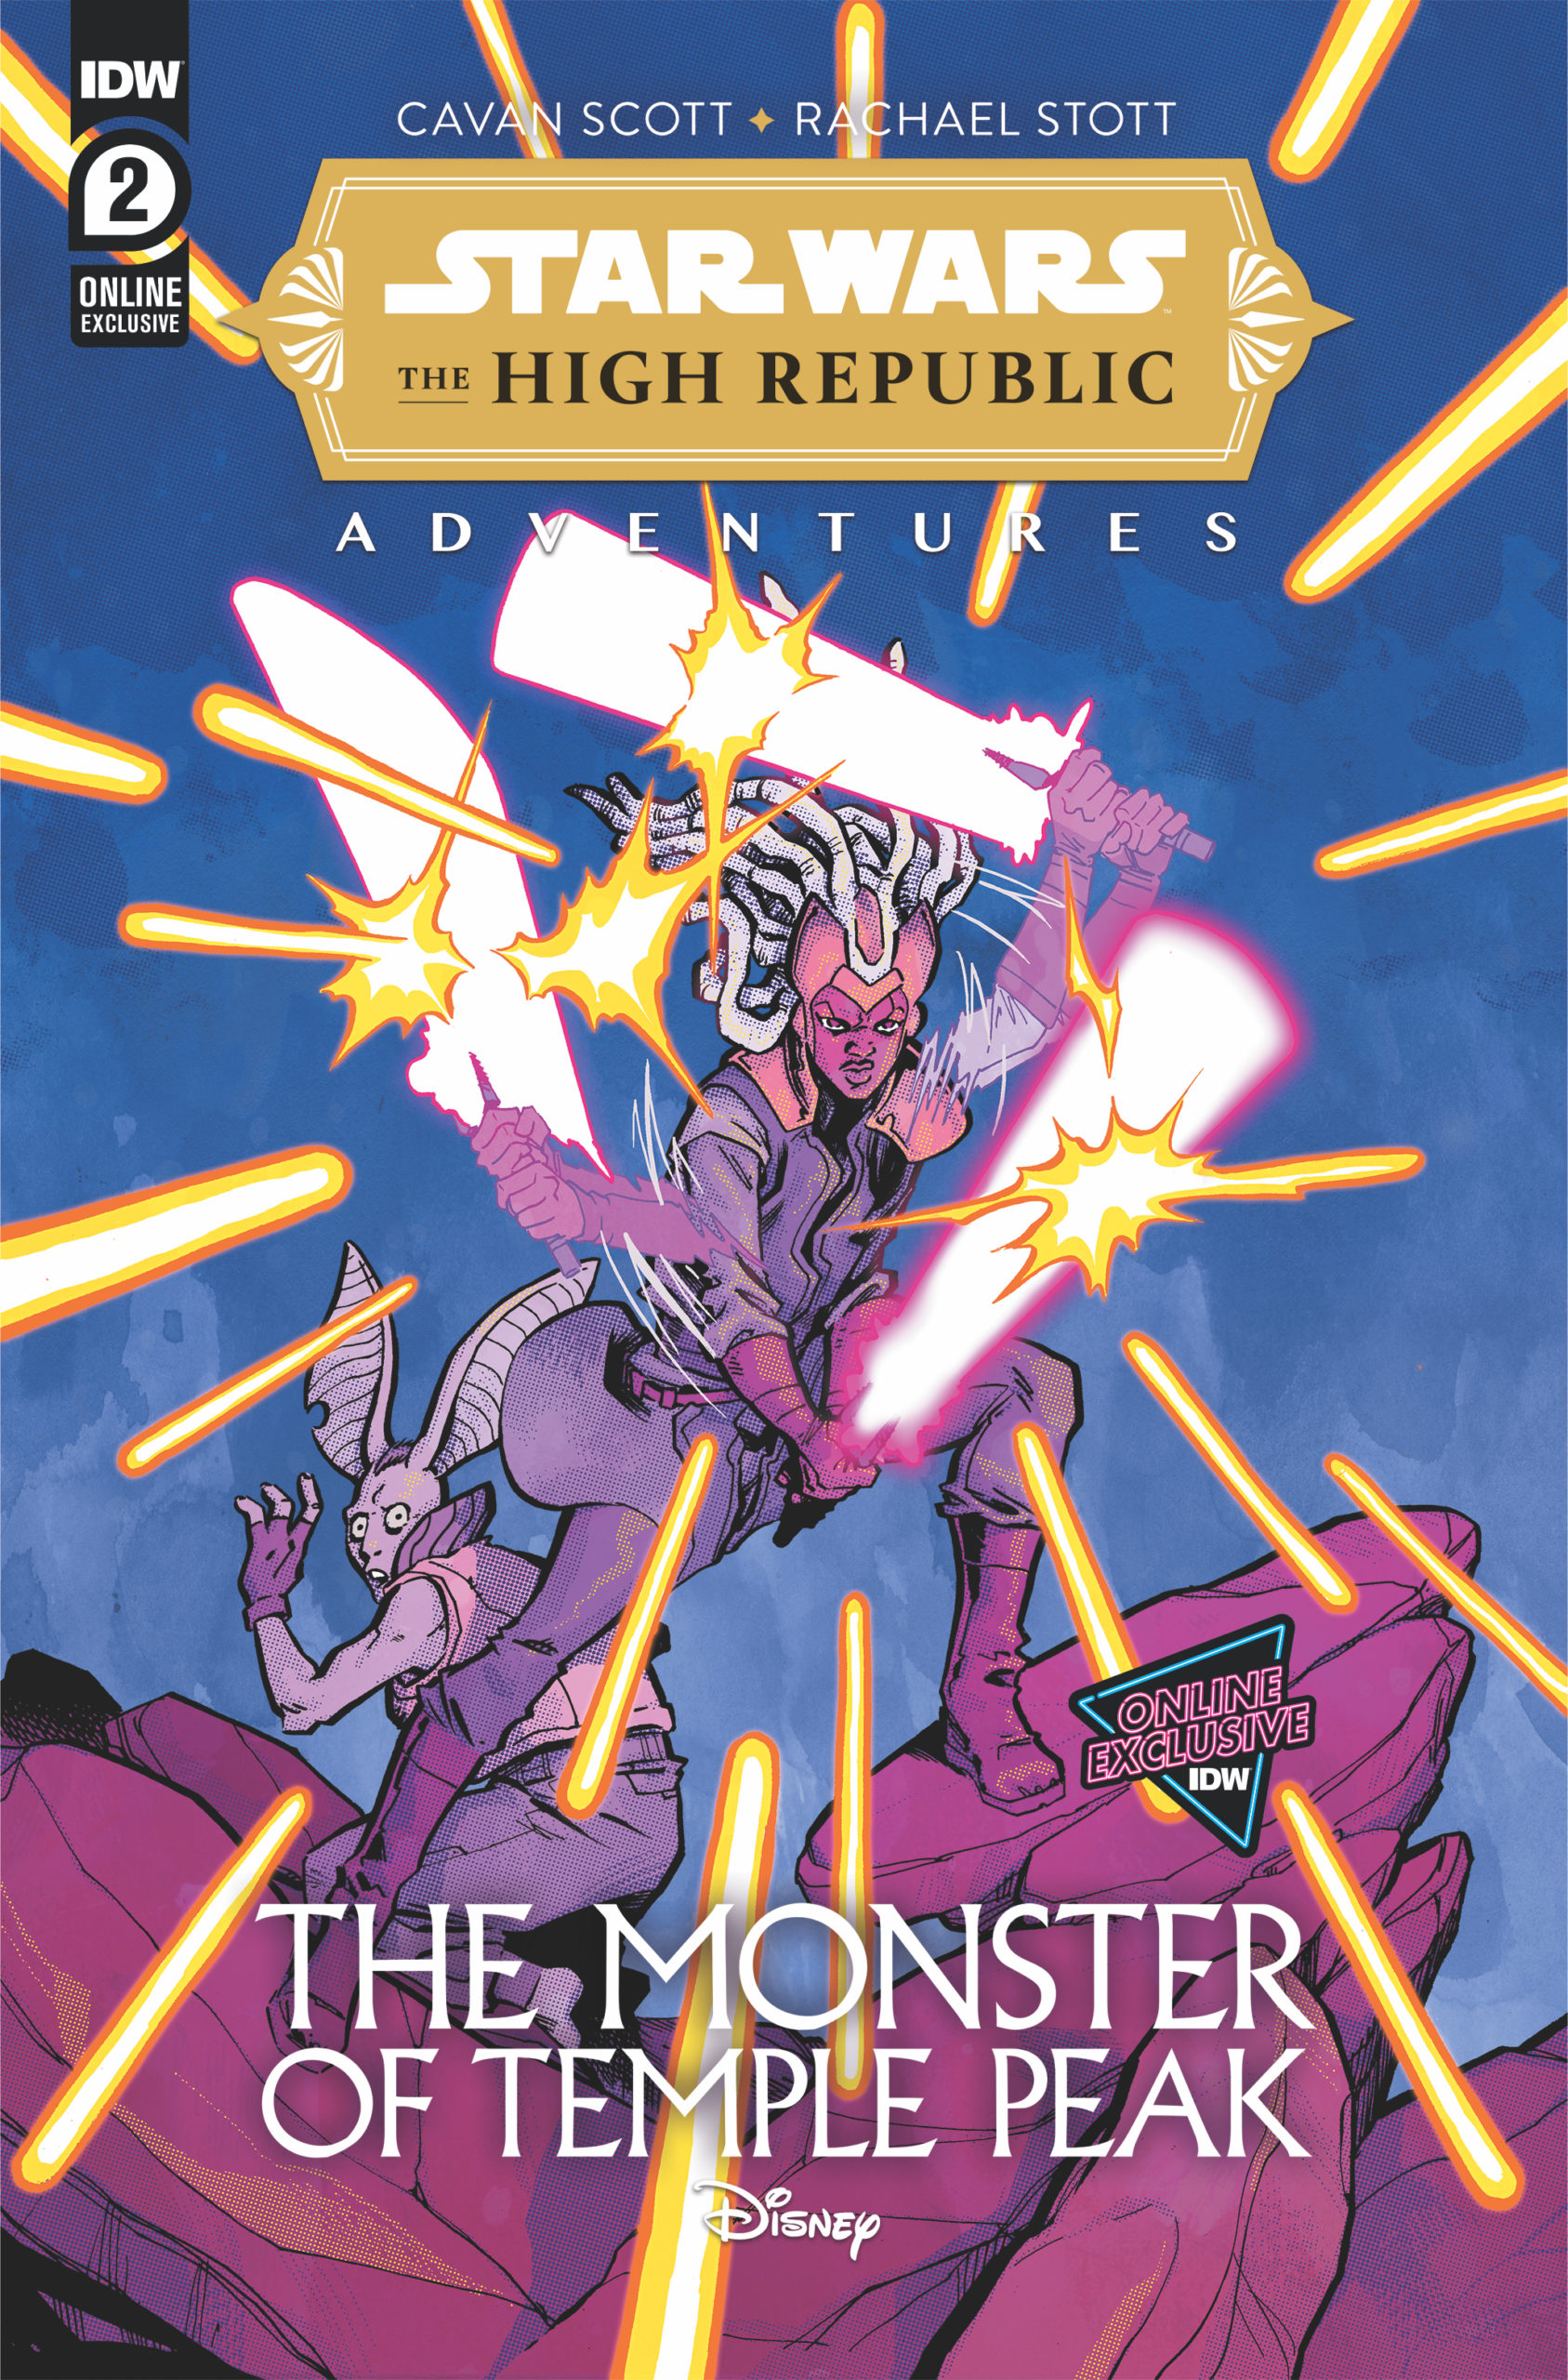 The High Republic Adventures: The Monster of Temple Peak #2 (Ilias Kyriazis Variant Cover) (15.09.2022)